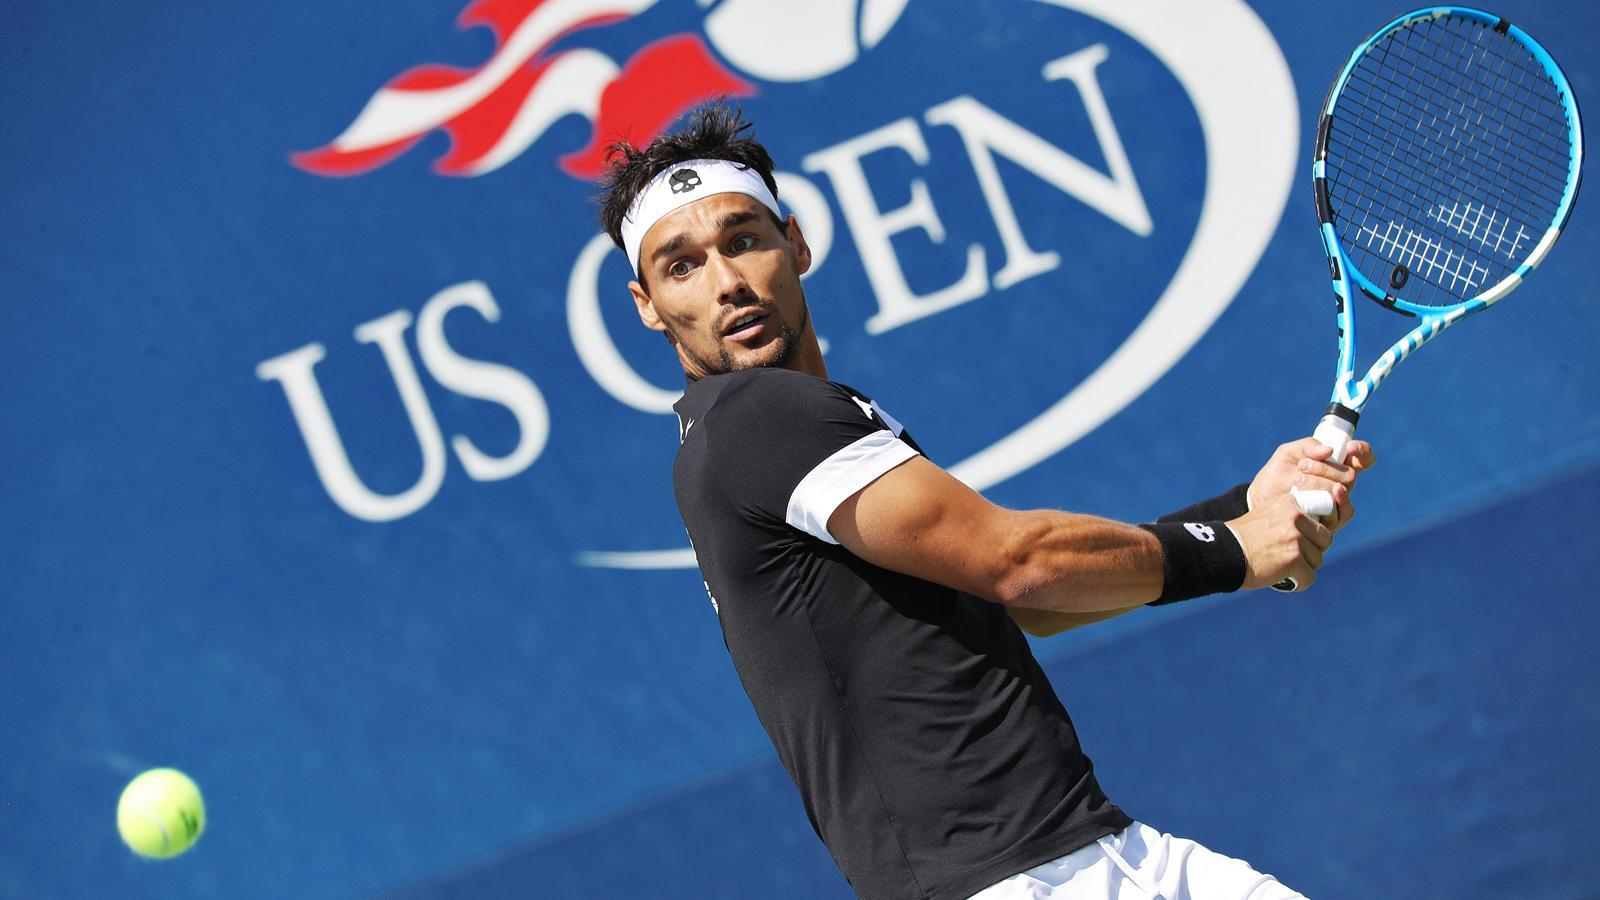 Fabio Fognini - Player Profile - Tennis - Eurosport